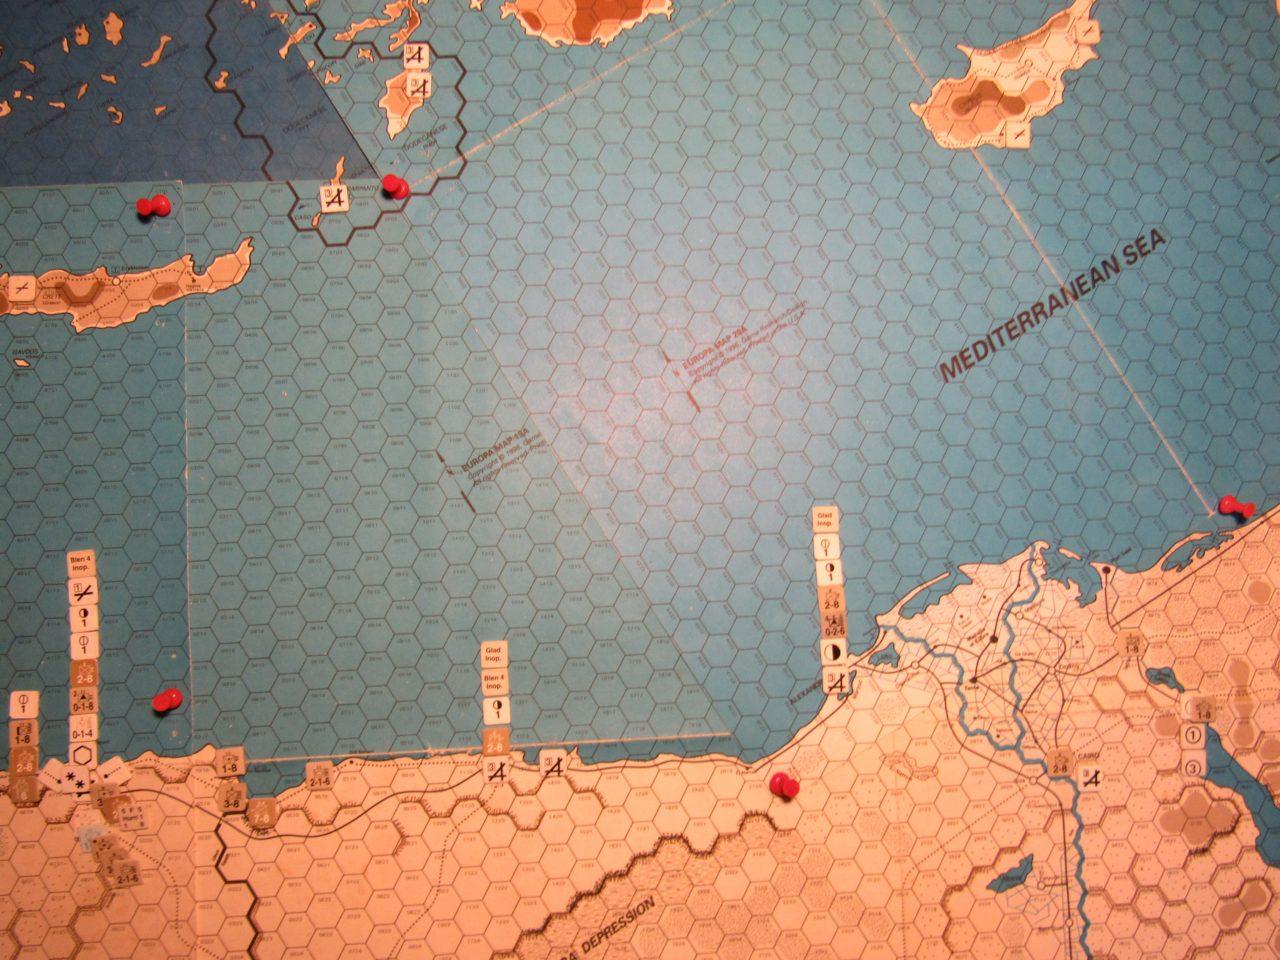 WW 1941 ME/ER-II/Crete Scenario Apr I 41 Apr I 41 Allied EOT dispositions: Eastern Libya & Egypt